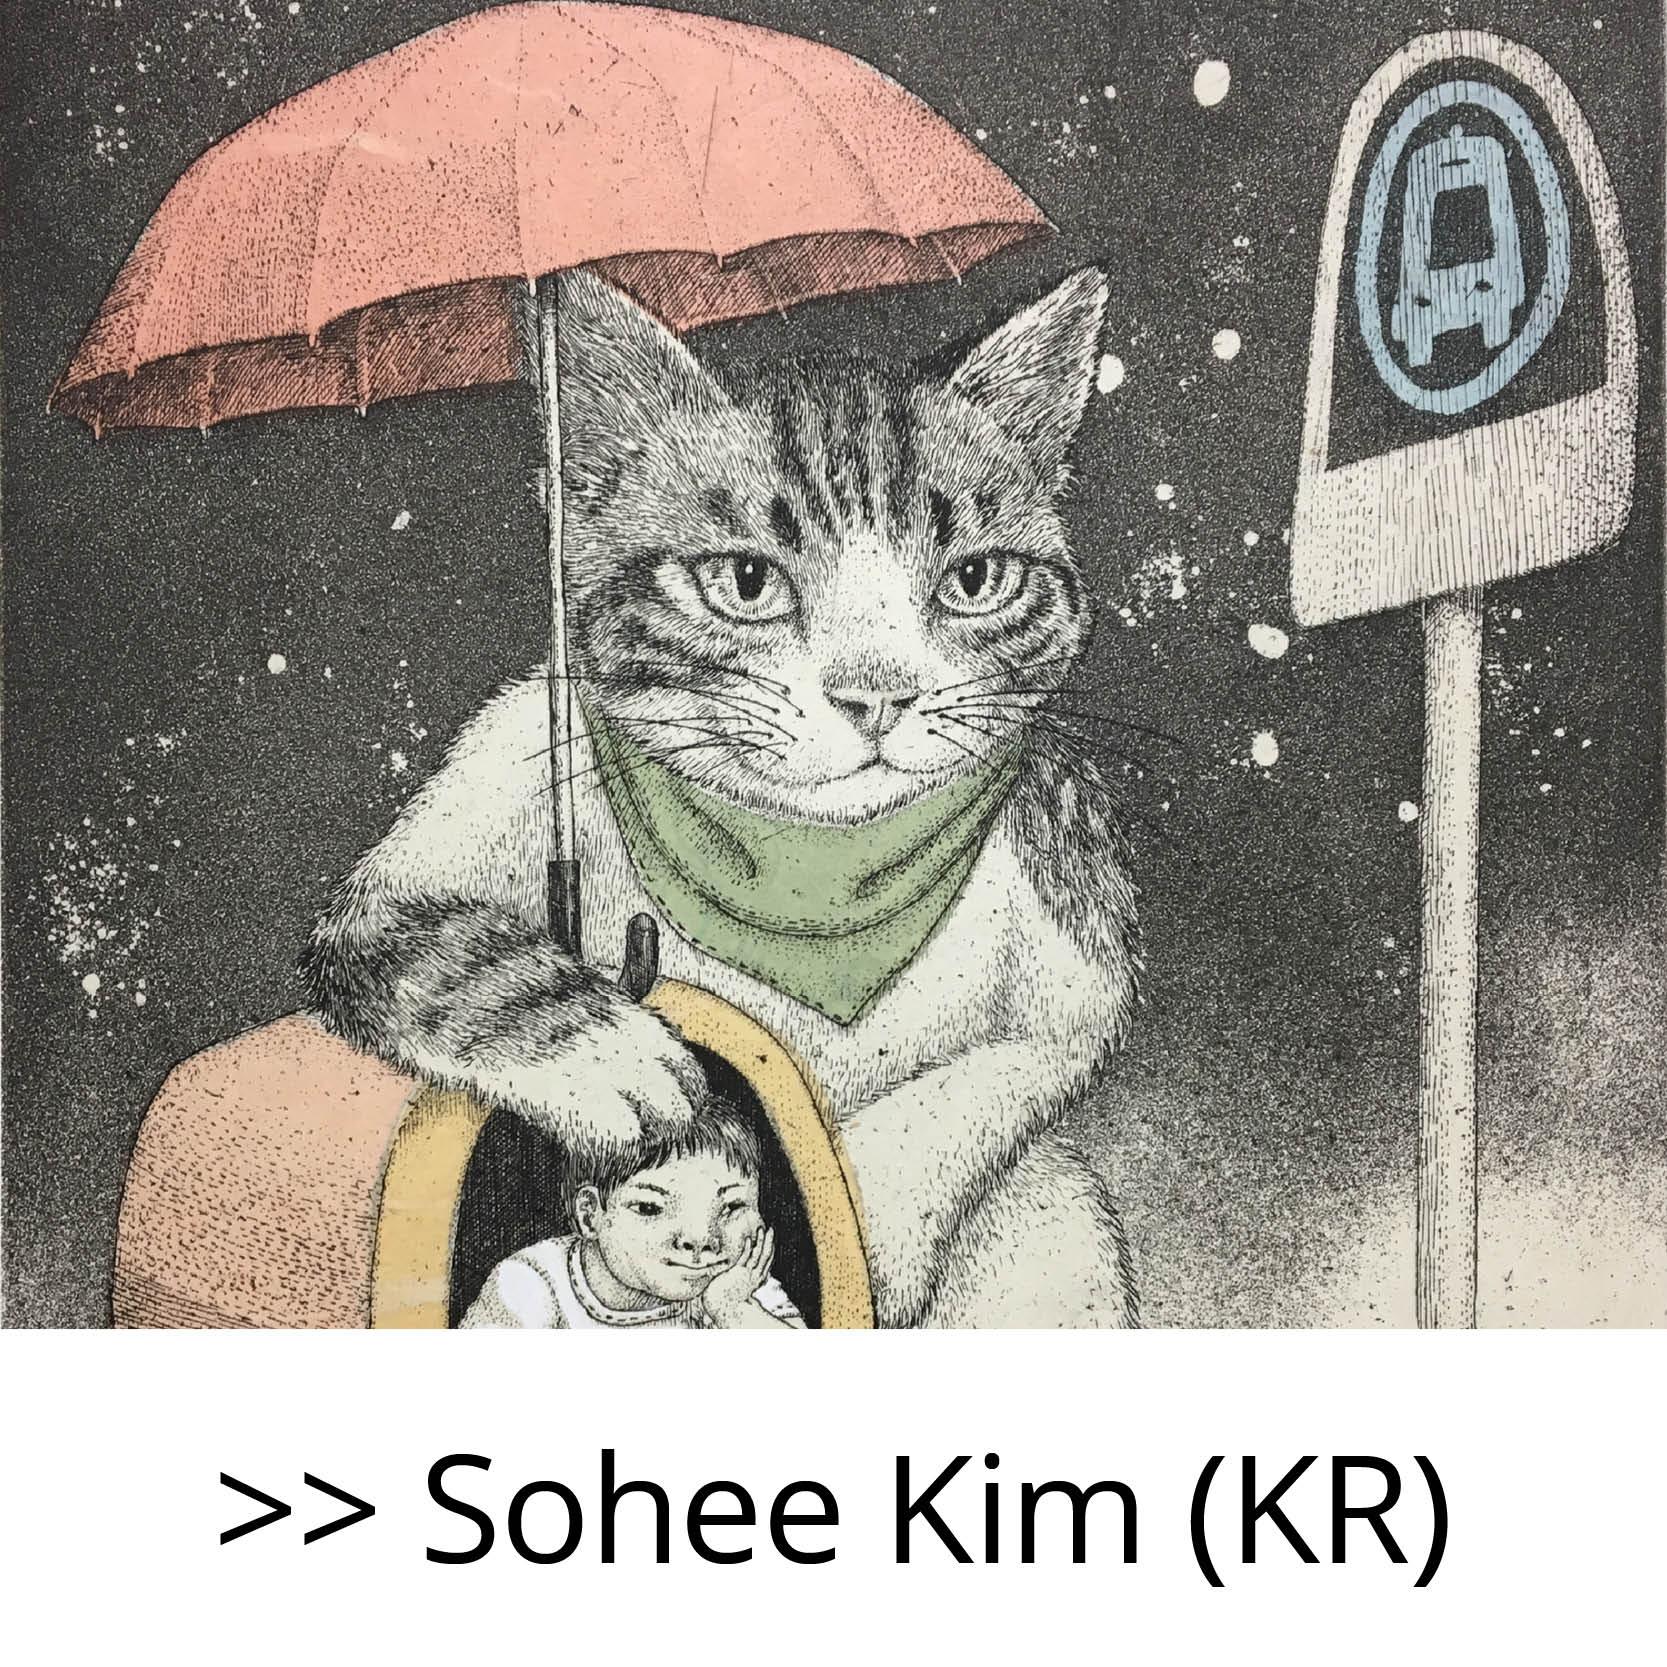 Sohee_Kim_(KR)